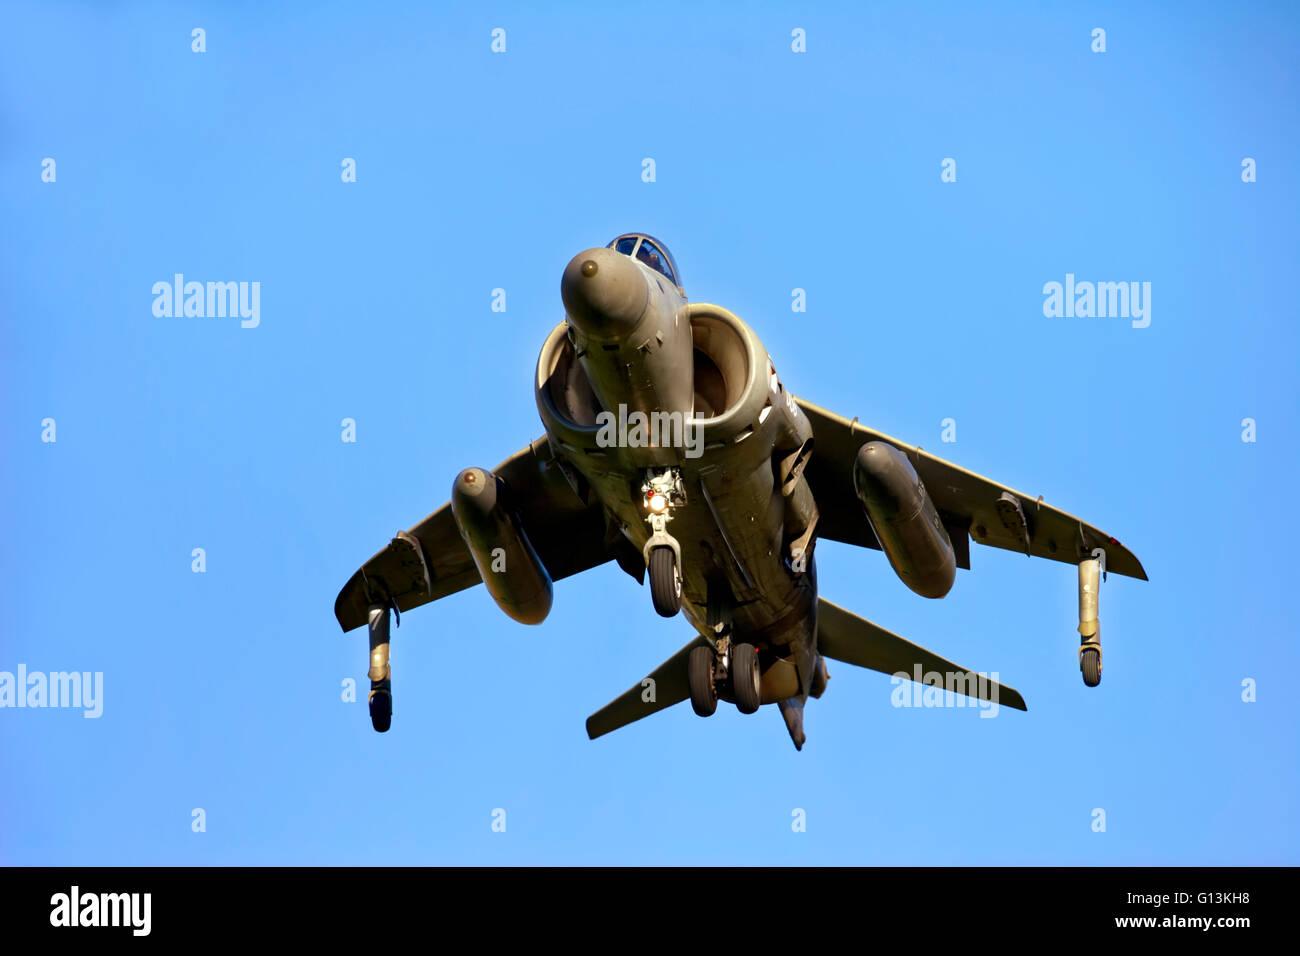 A Royal Navy Fleet Air Arm British Aerospace Sea Harrier F/A.2 XZ440 009 (cn 41H-912003) of 801NAS at RNAS Yeovilton, - Stock Image